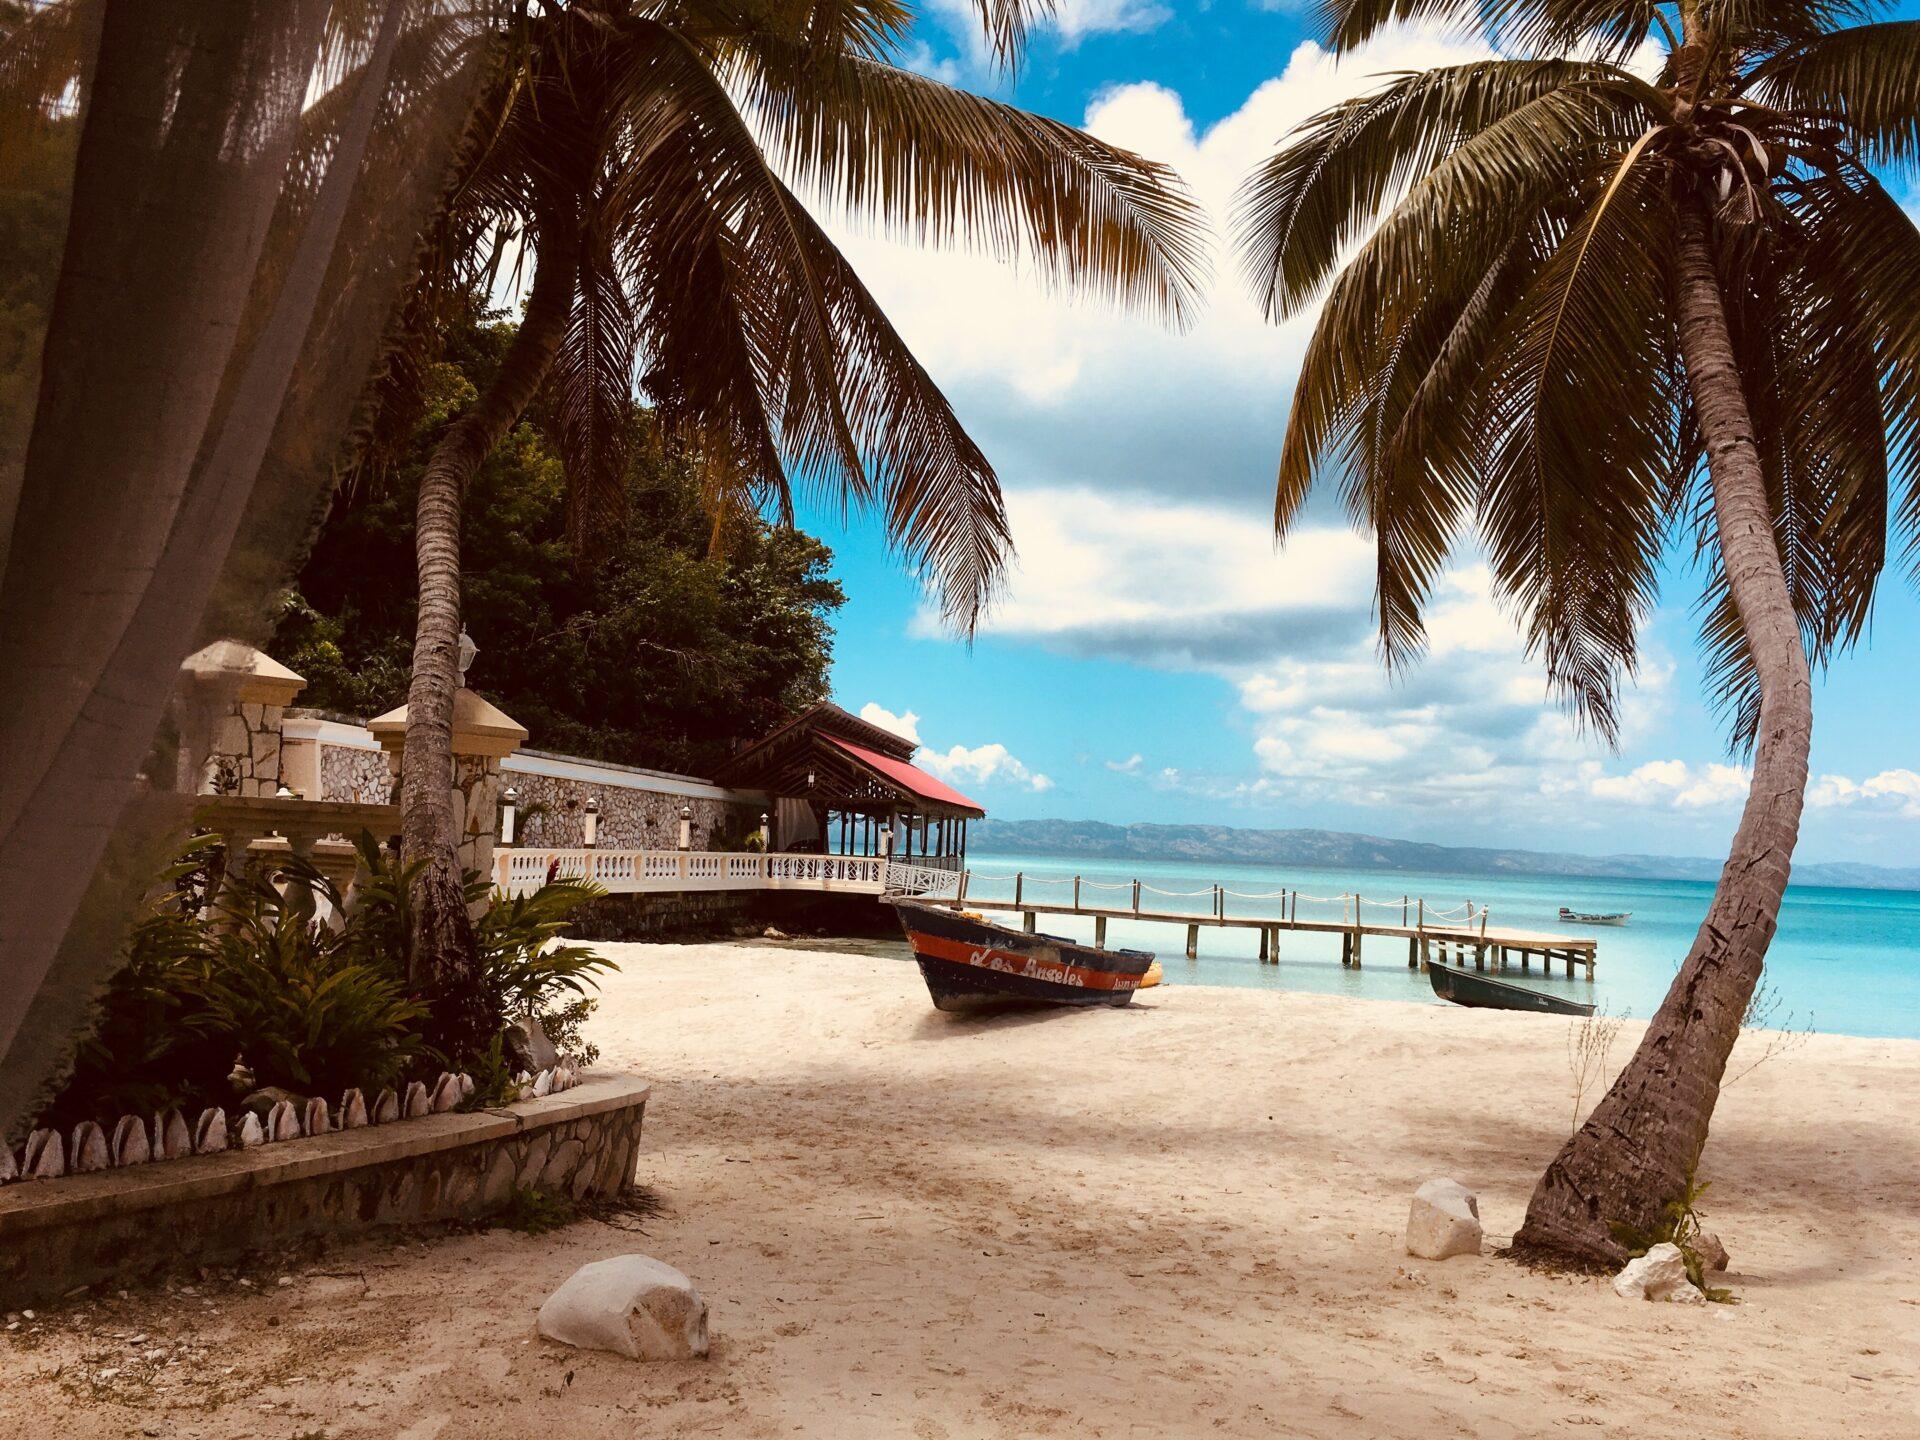 haiti-beach-claudia-altamimi-caribbean